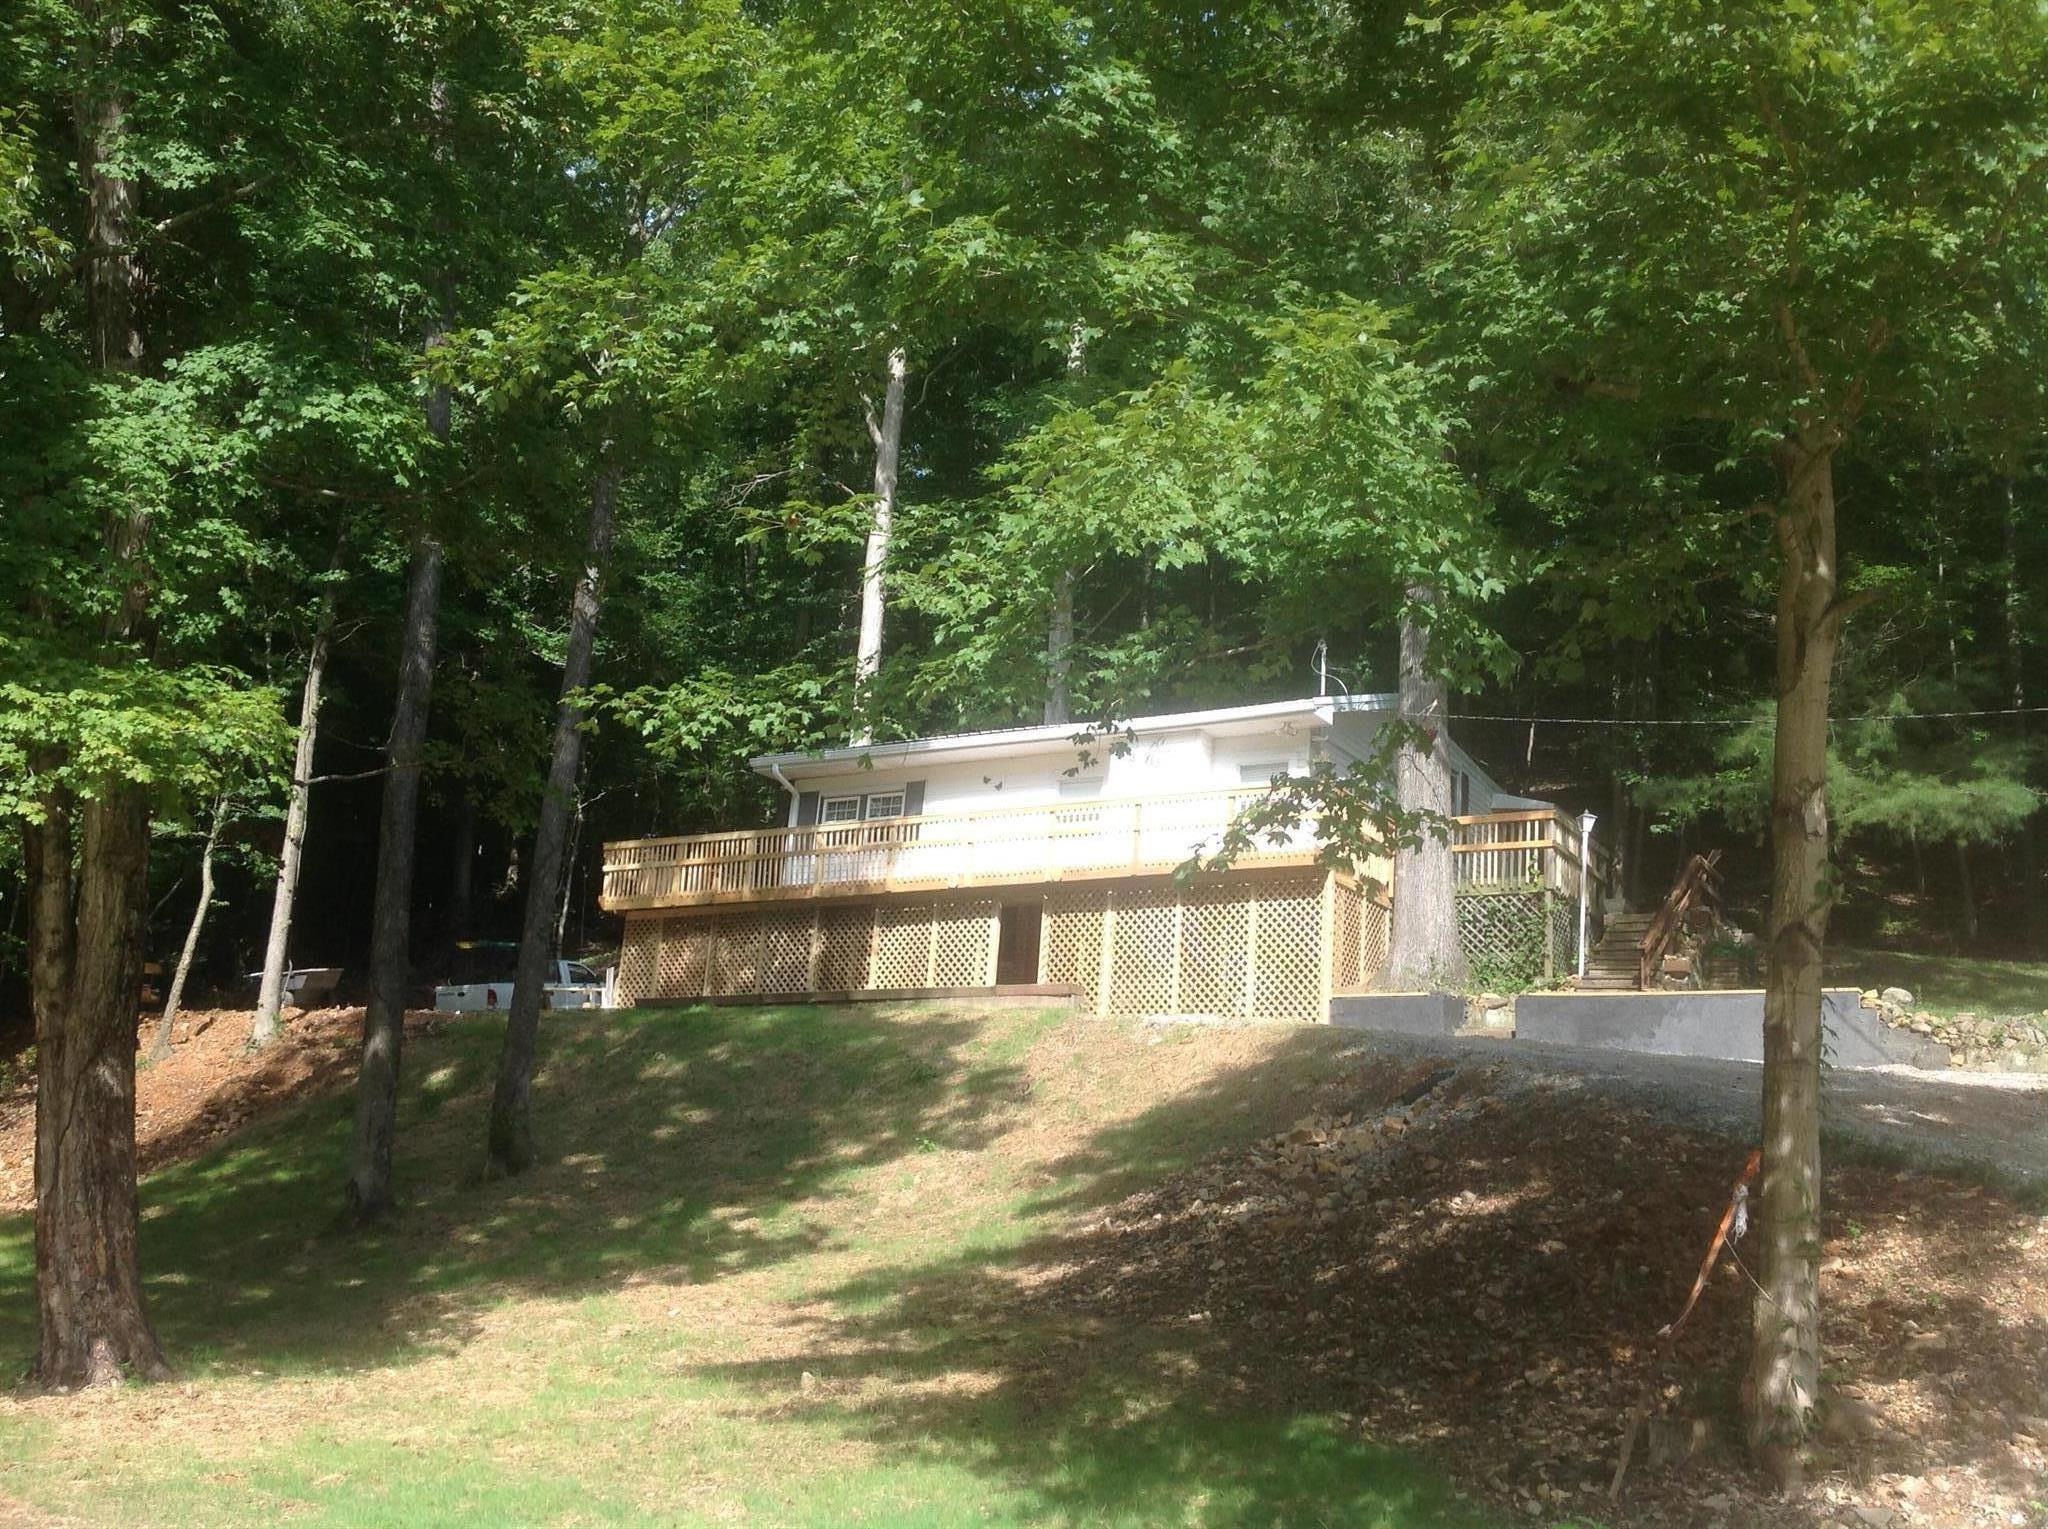 10070 Clydeton Rd, Waverly, TN 37185 - Waverly, TN real estate listing